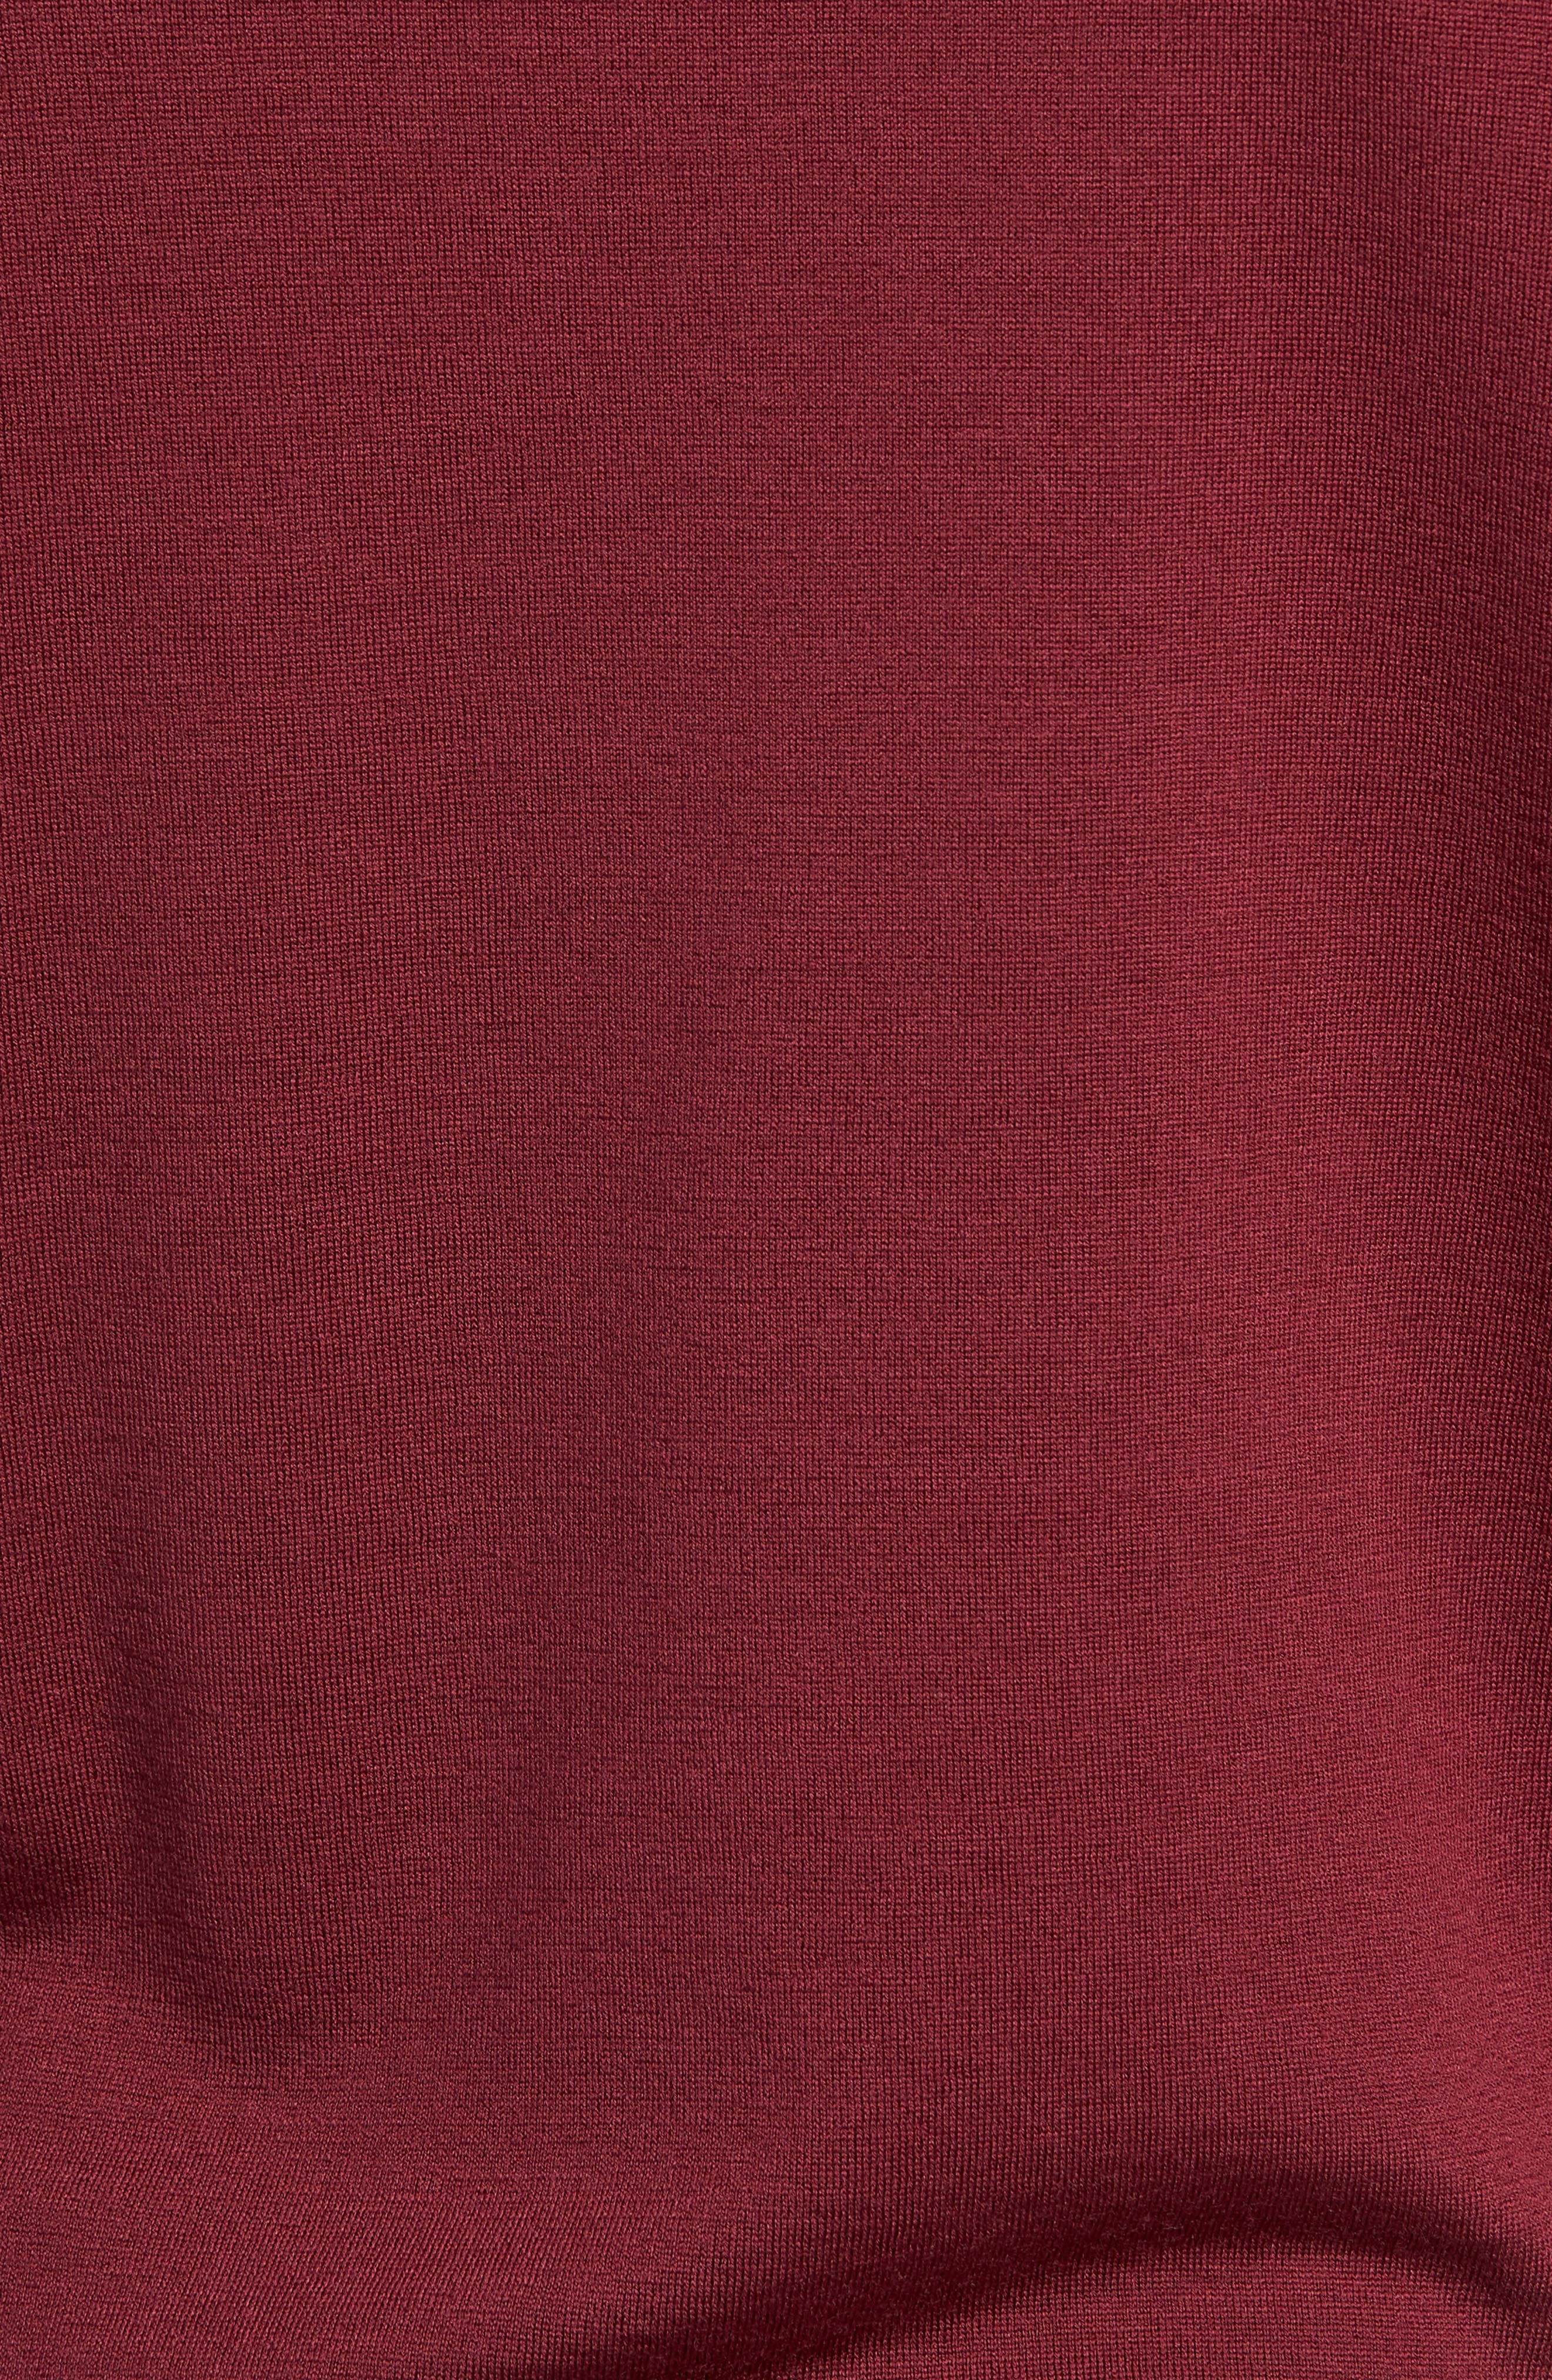 'Marcus' Easy Fit Crewneck Wool Sweater,                             Alternate thumbnail 5, color,                             BOREDAUX